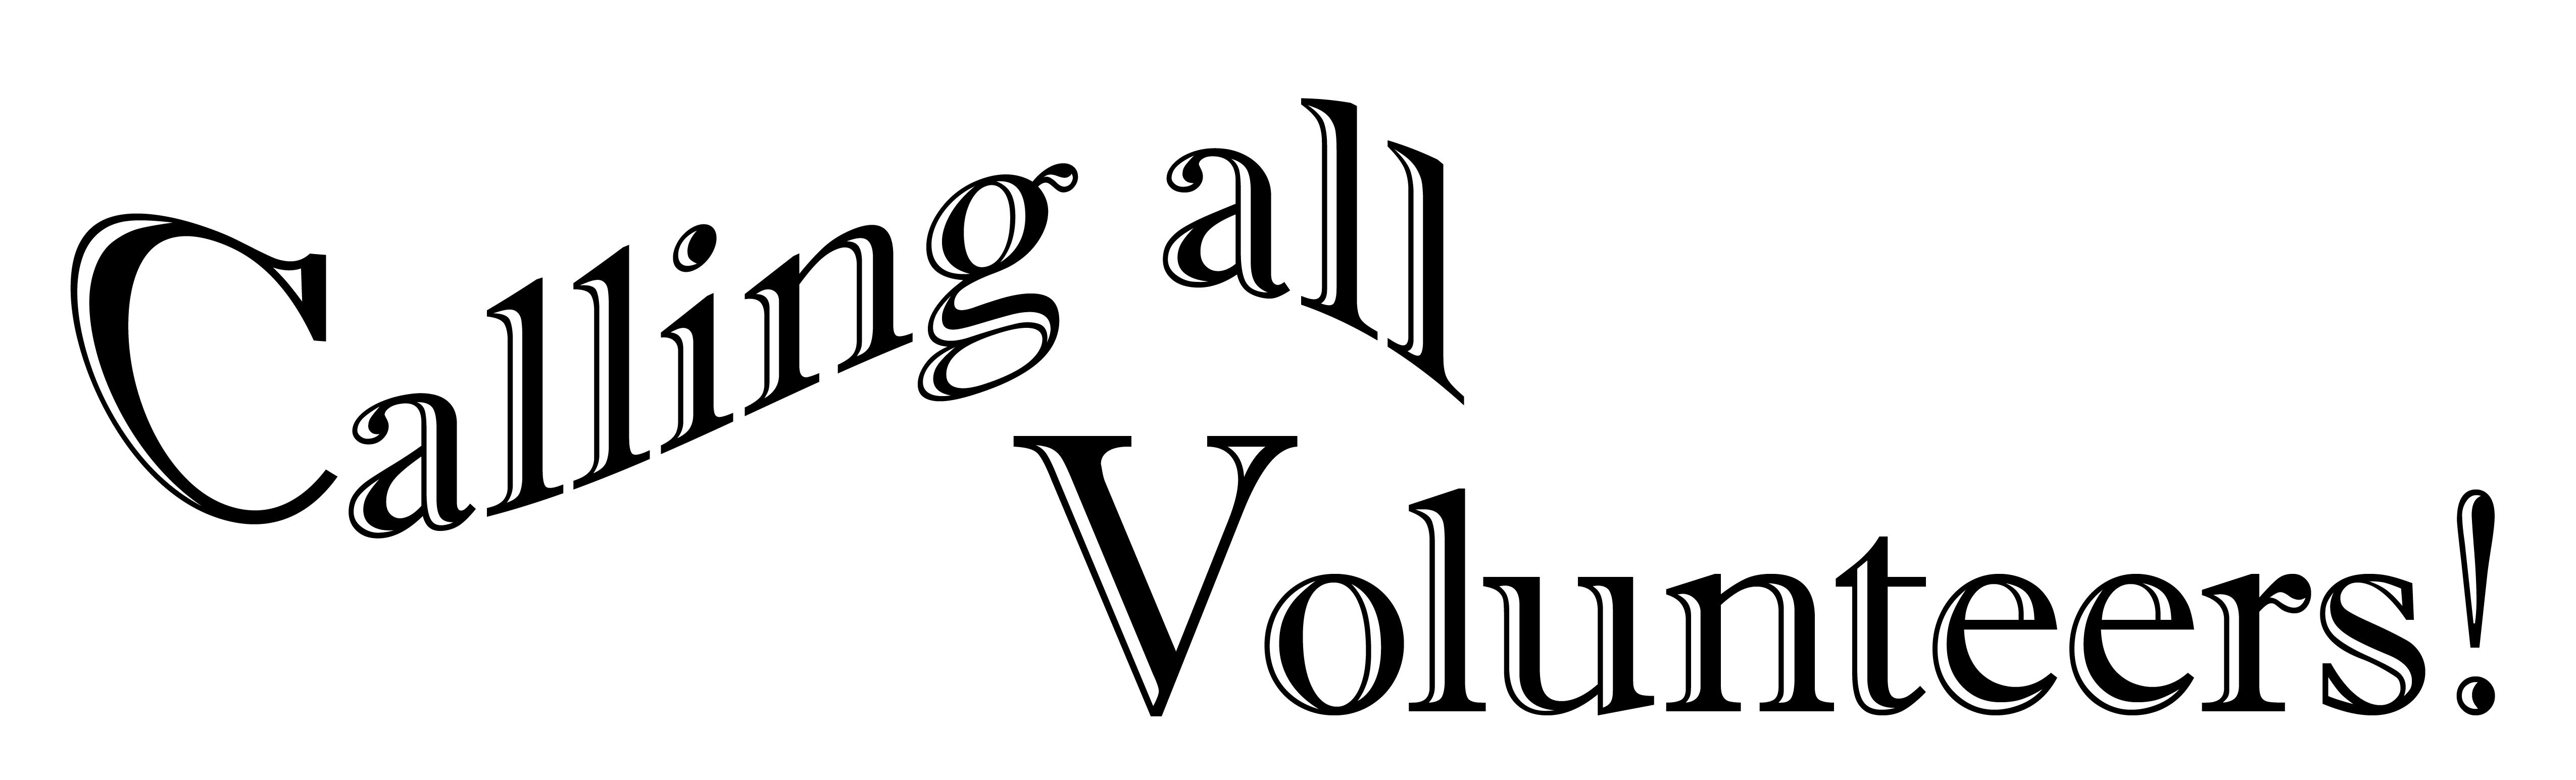 Volunteer flyer pdf two. Volunteering clipart calling all